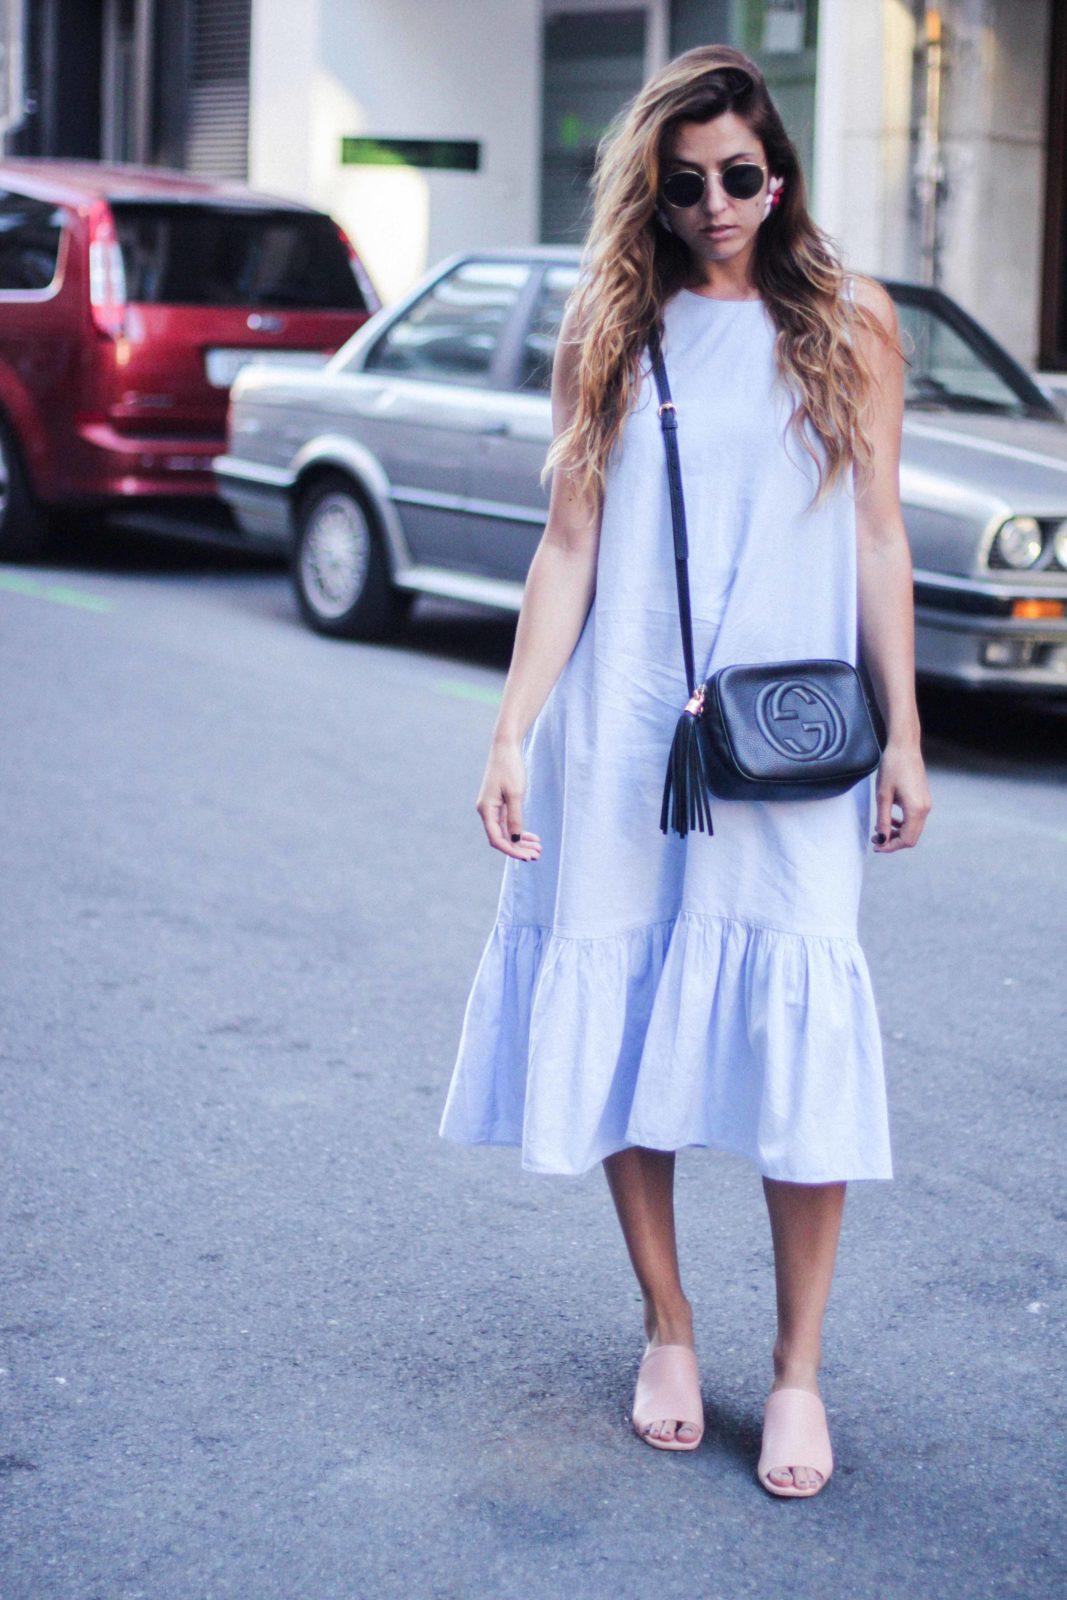 vestido_azul_zara_mules_rosas-23